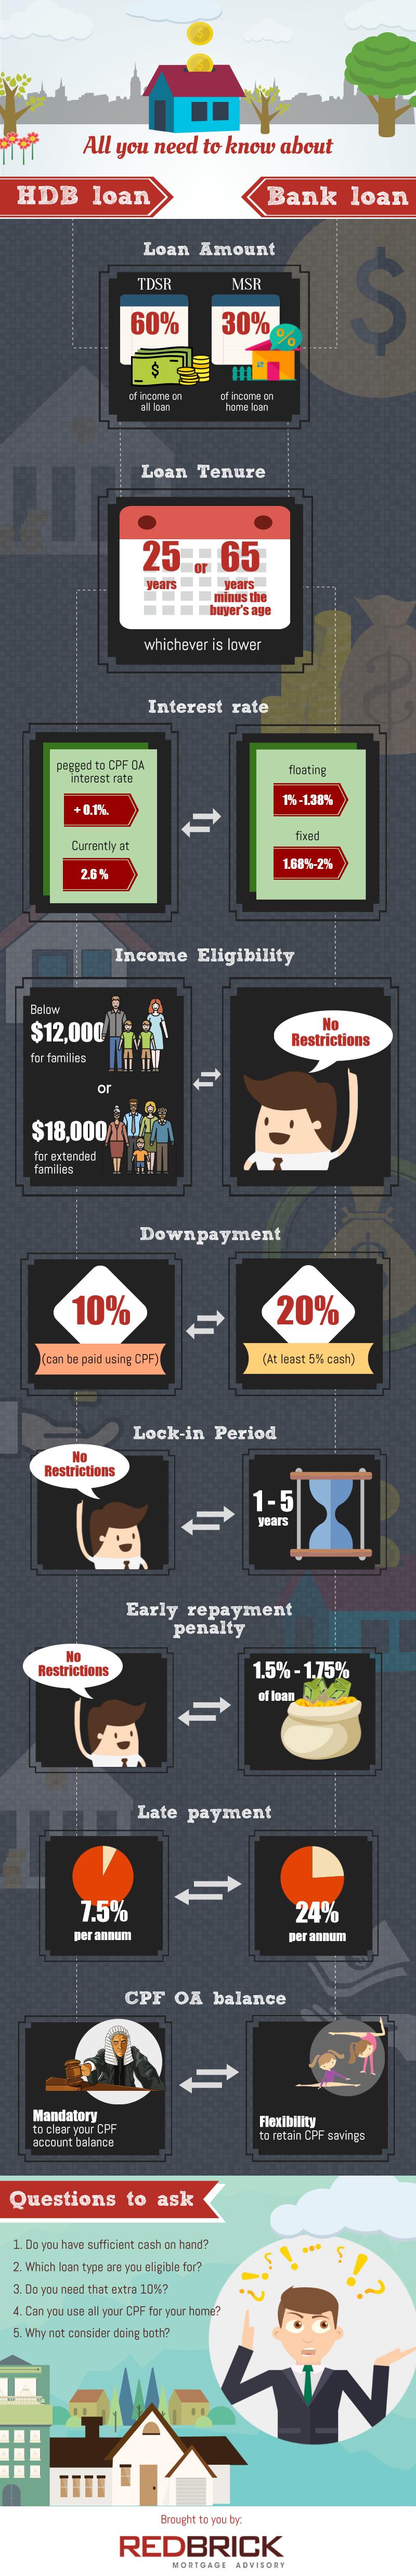 infographic-edited